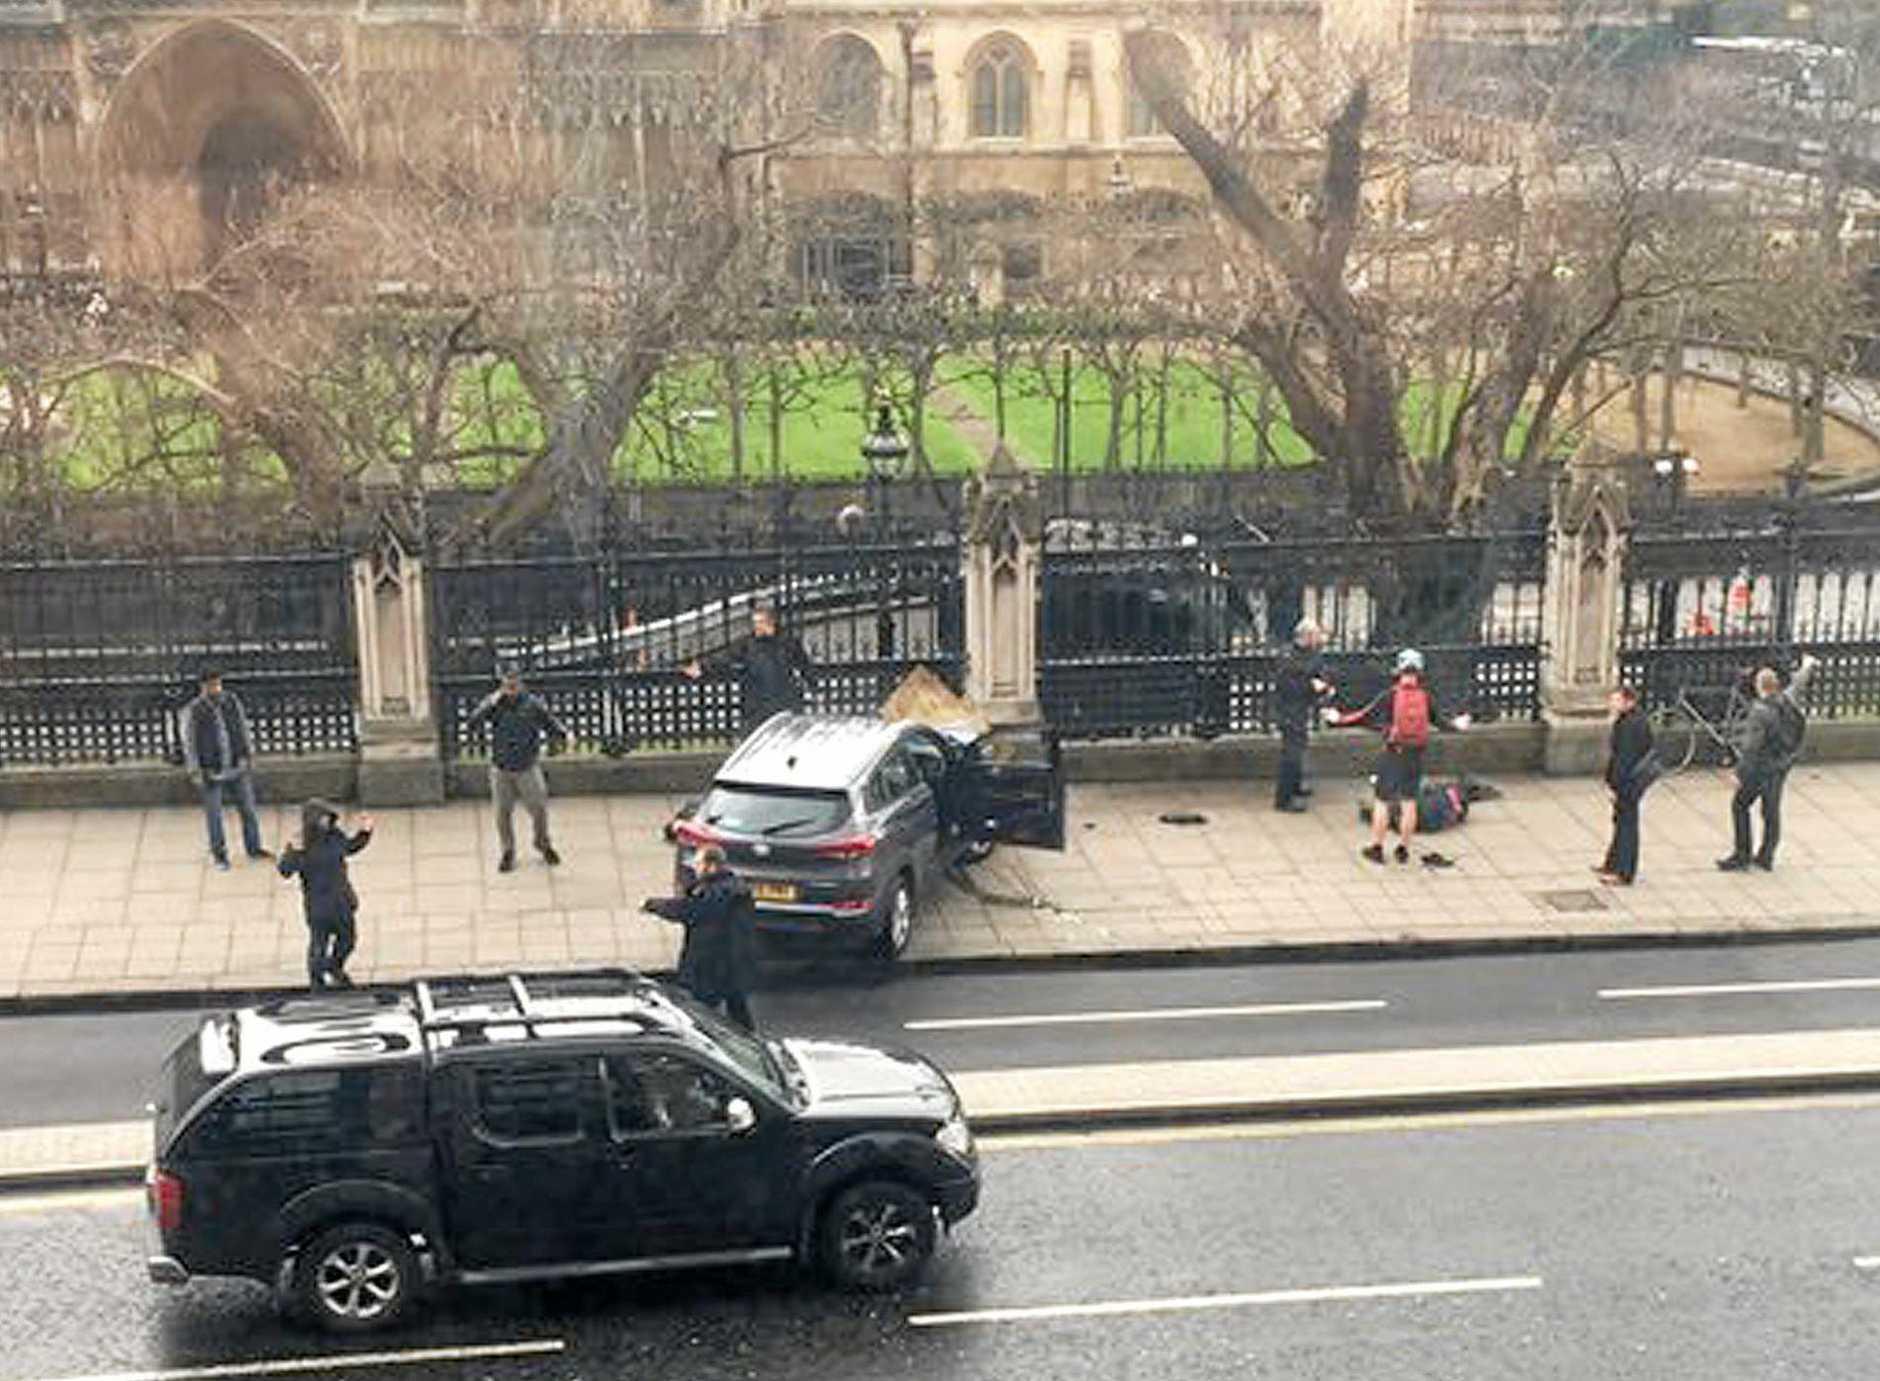 The scene of last week's terrorist attack on London's Westminster Bridge.